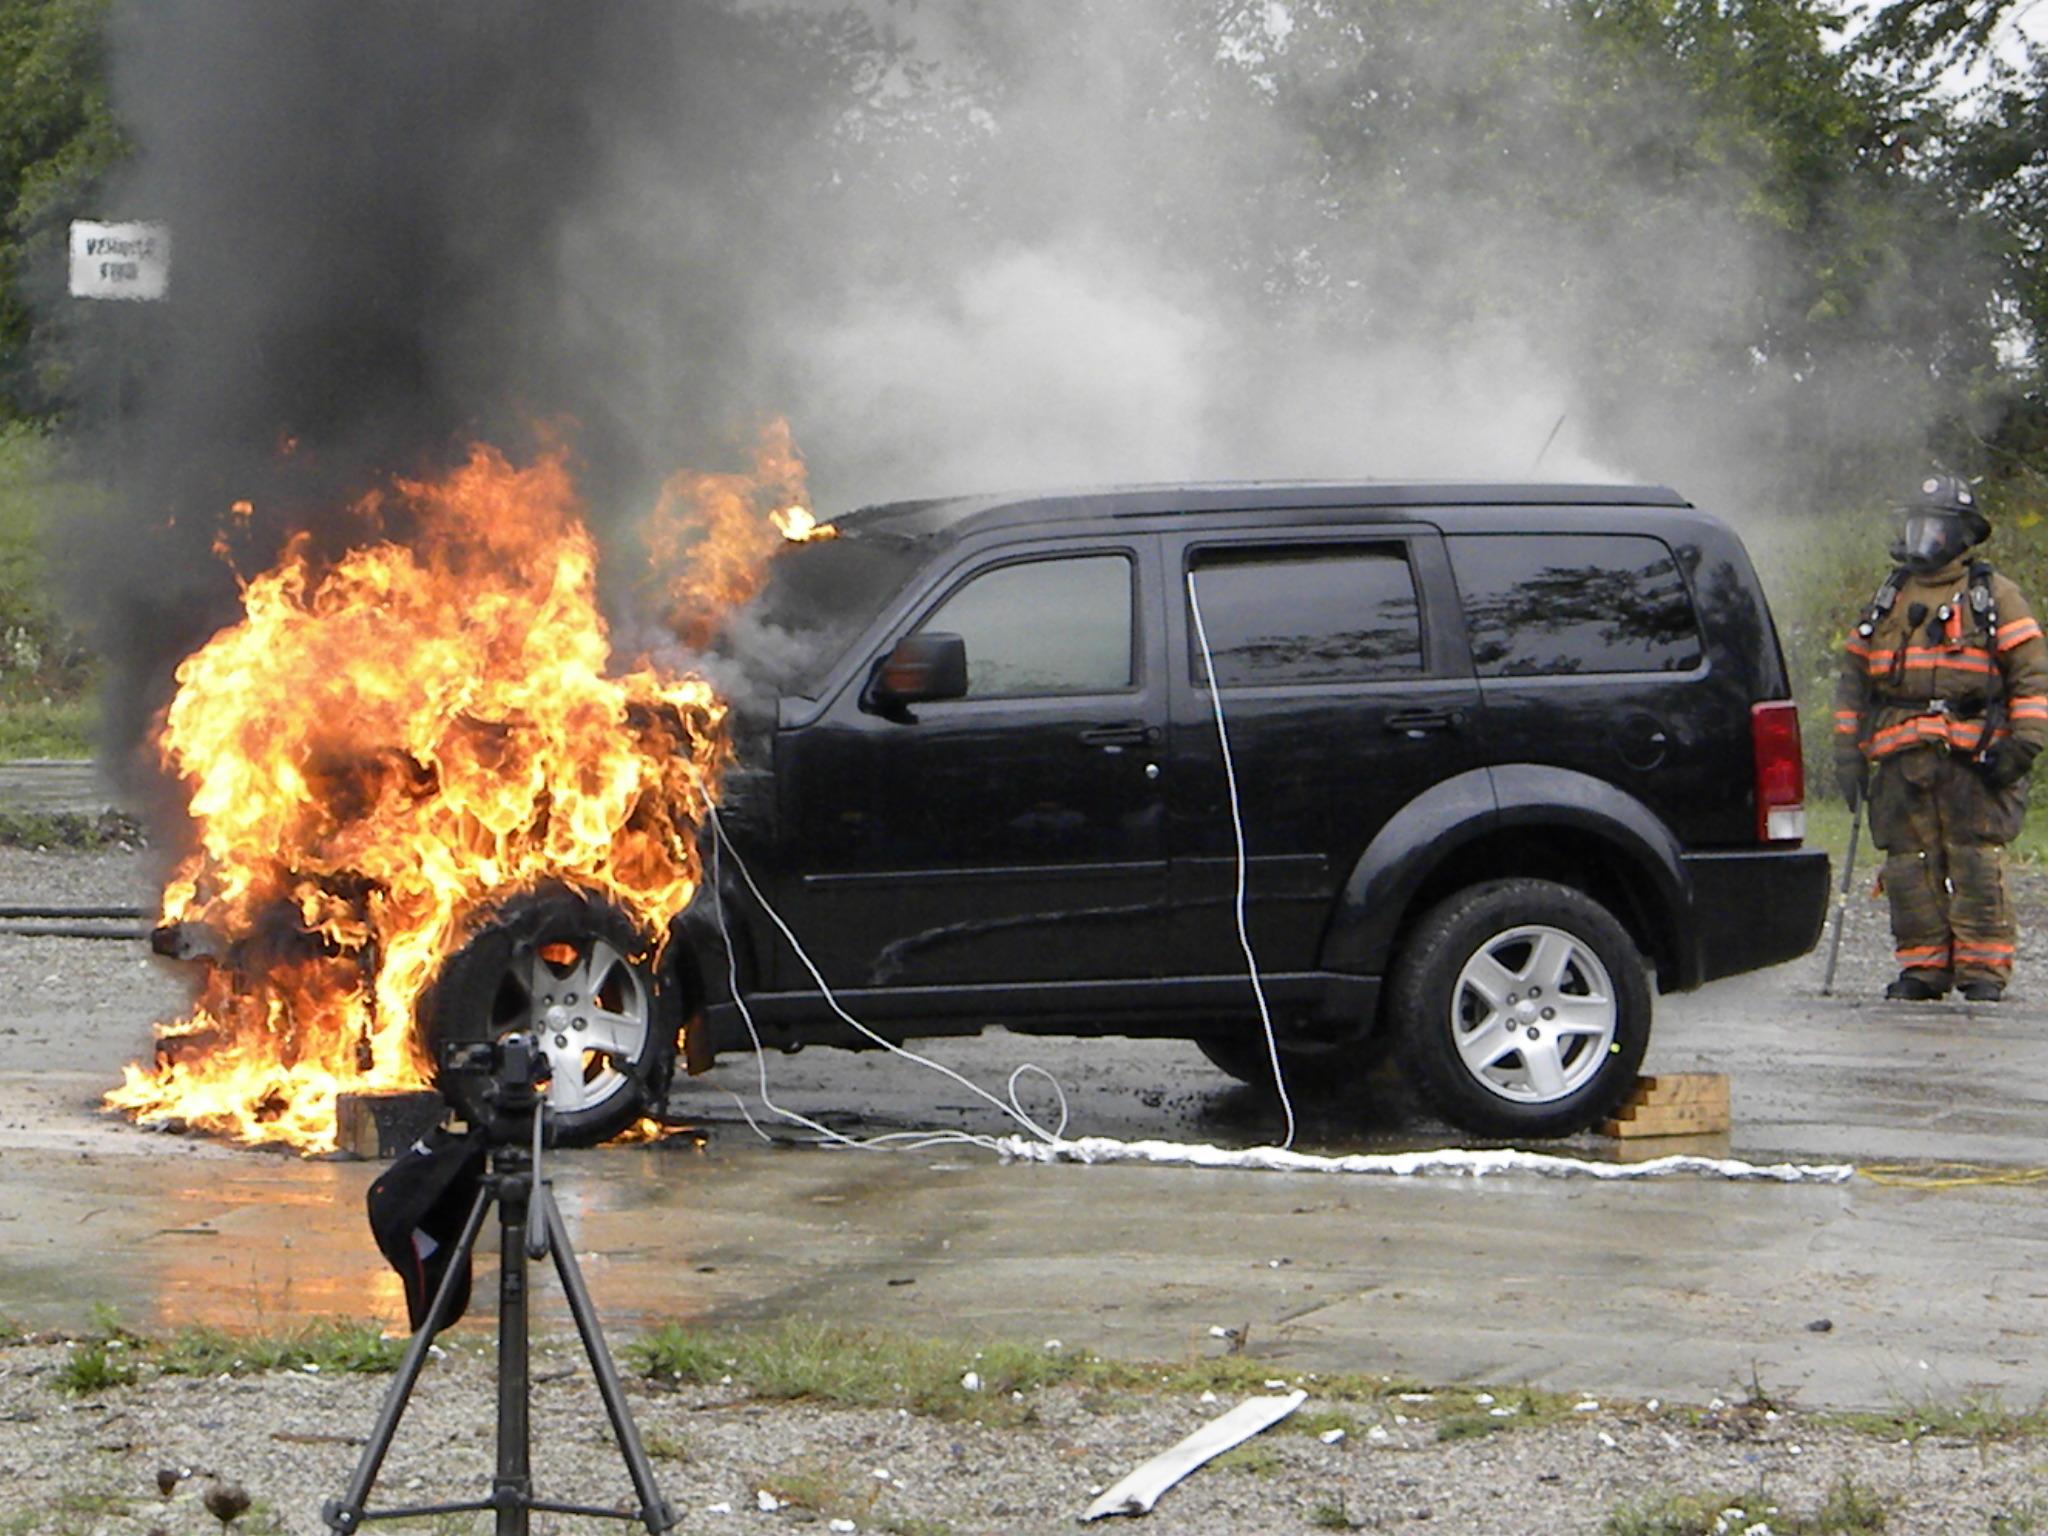 Services | Nova Scotia | Fire Dynamics Analysts